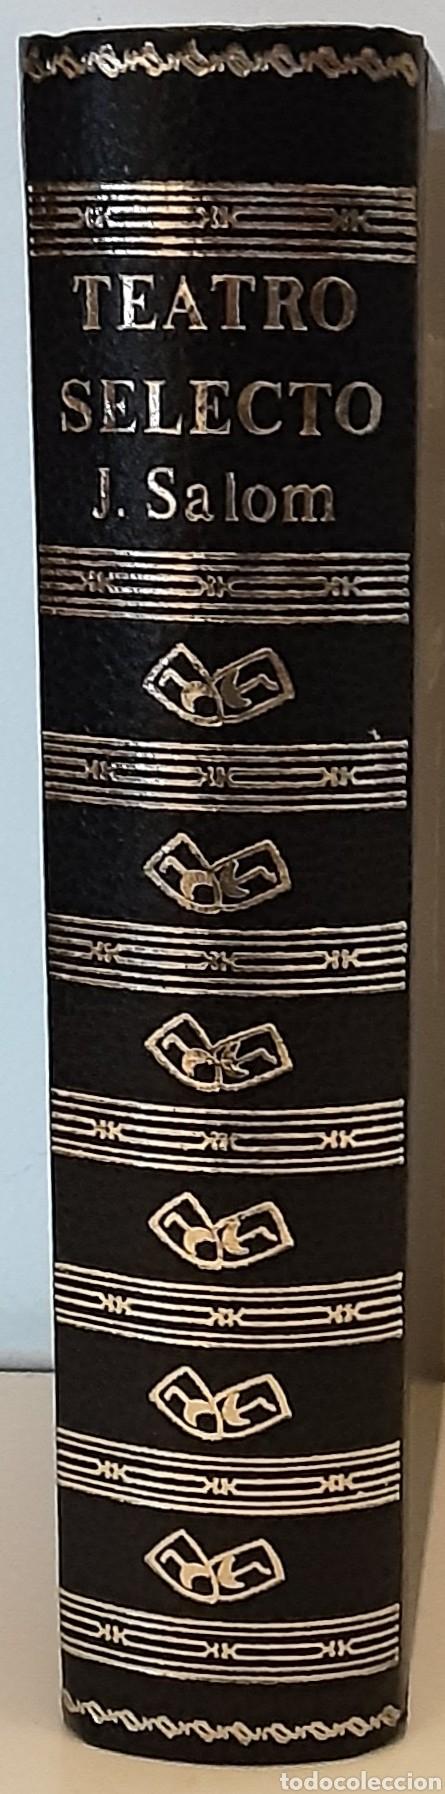 TEATRO SELECTO, JAIME SALOM. EDITORIAL ESCELICER, 1971 (Libros de Segunda Mano (posteriores a 1936) - Literatura - Teatro)